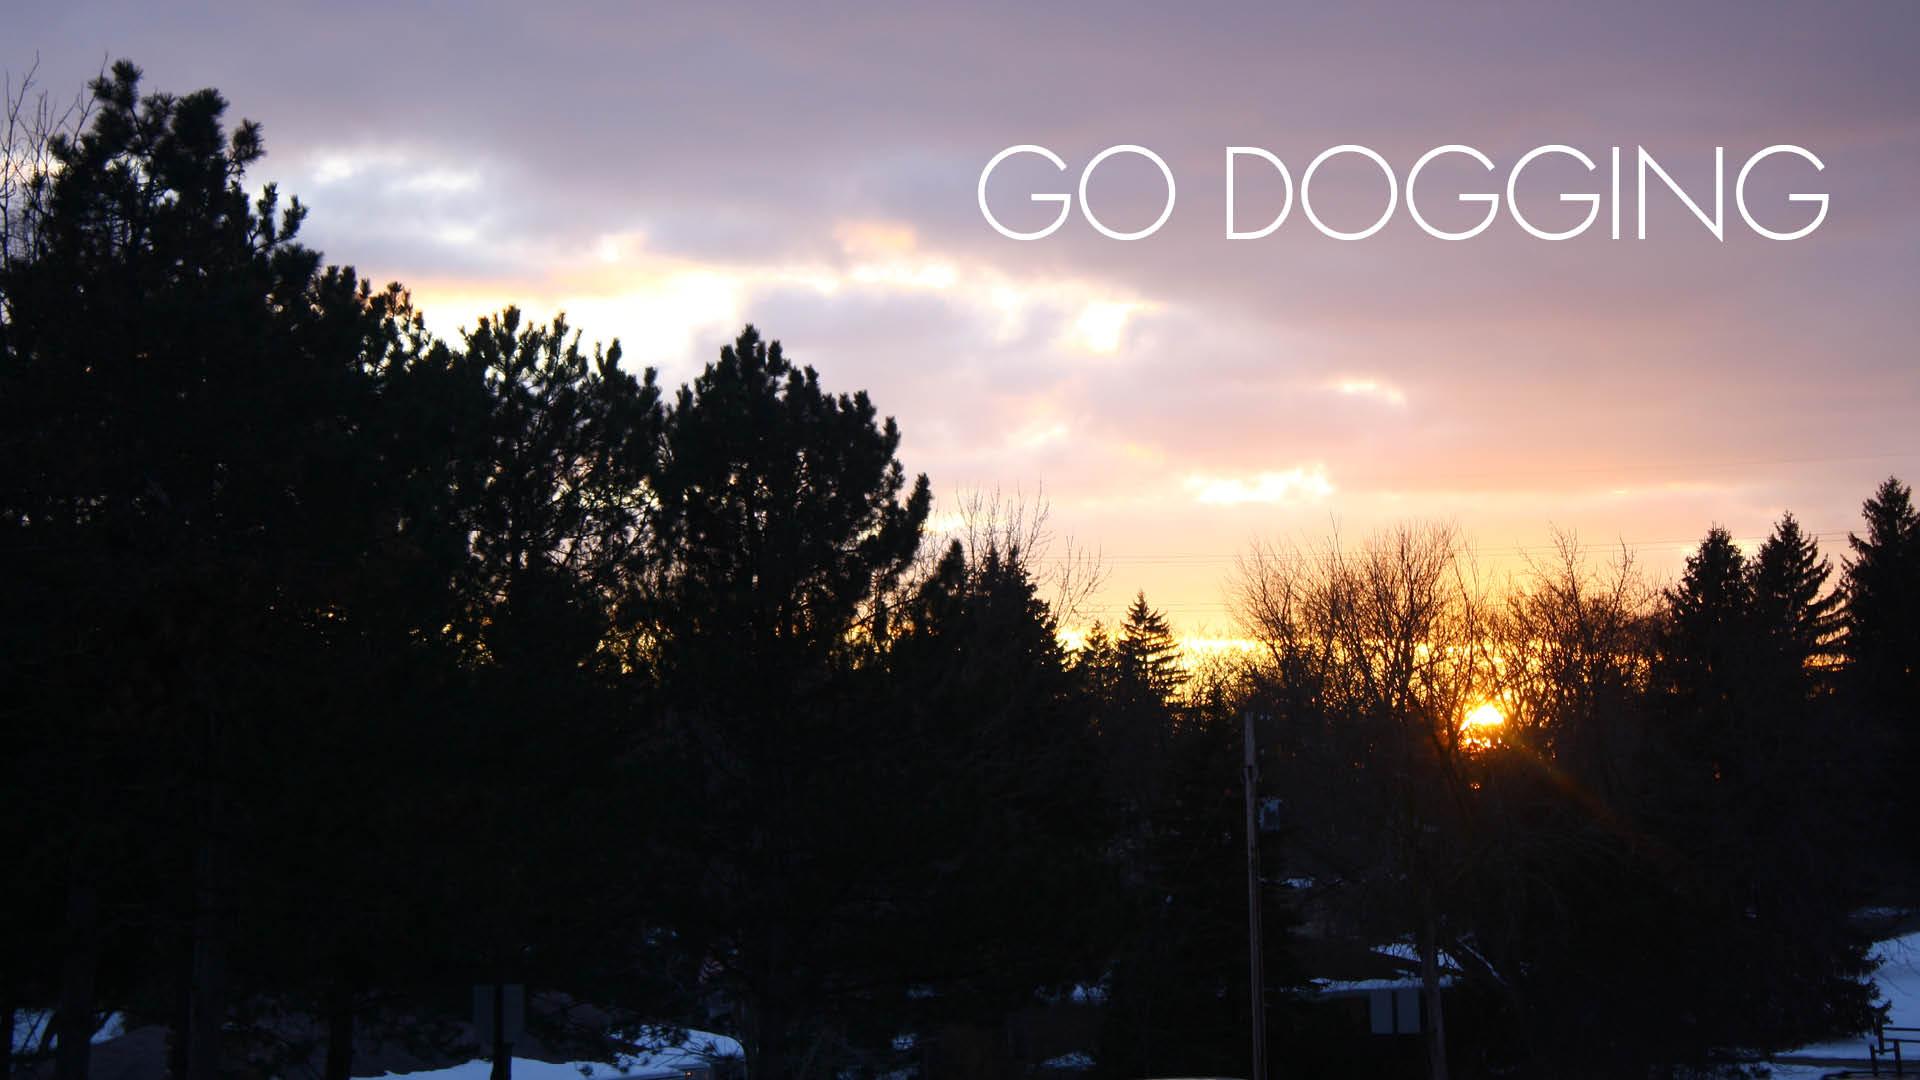 Go dogging.jpg